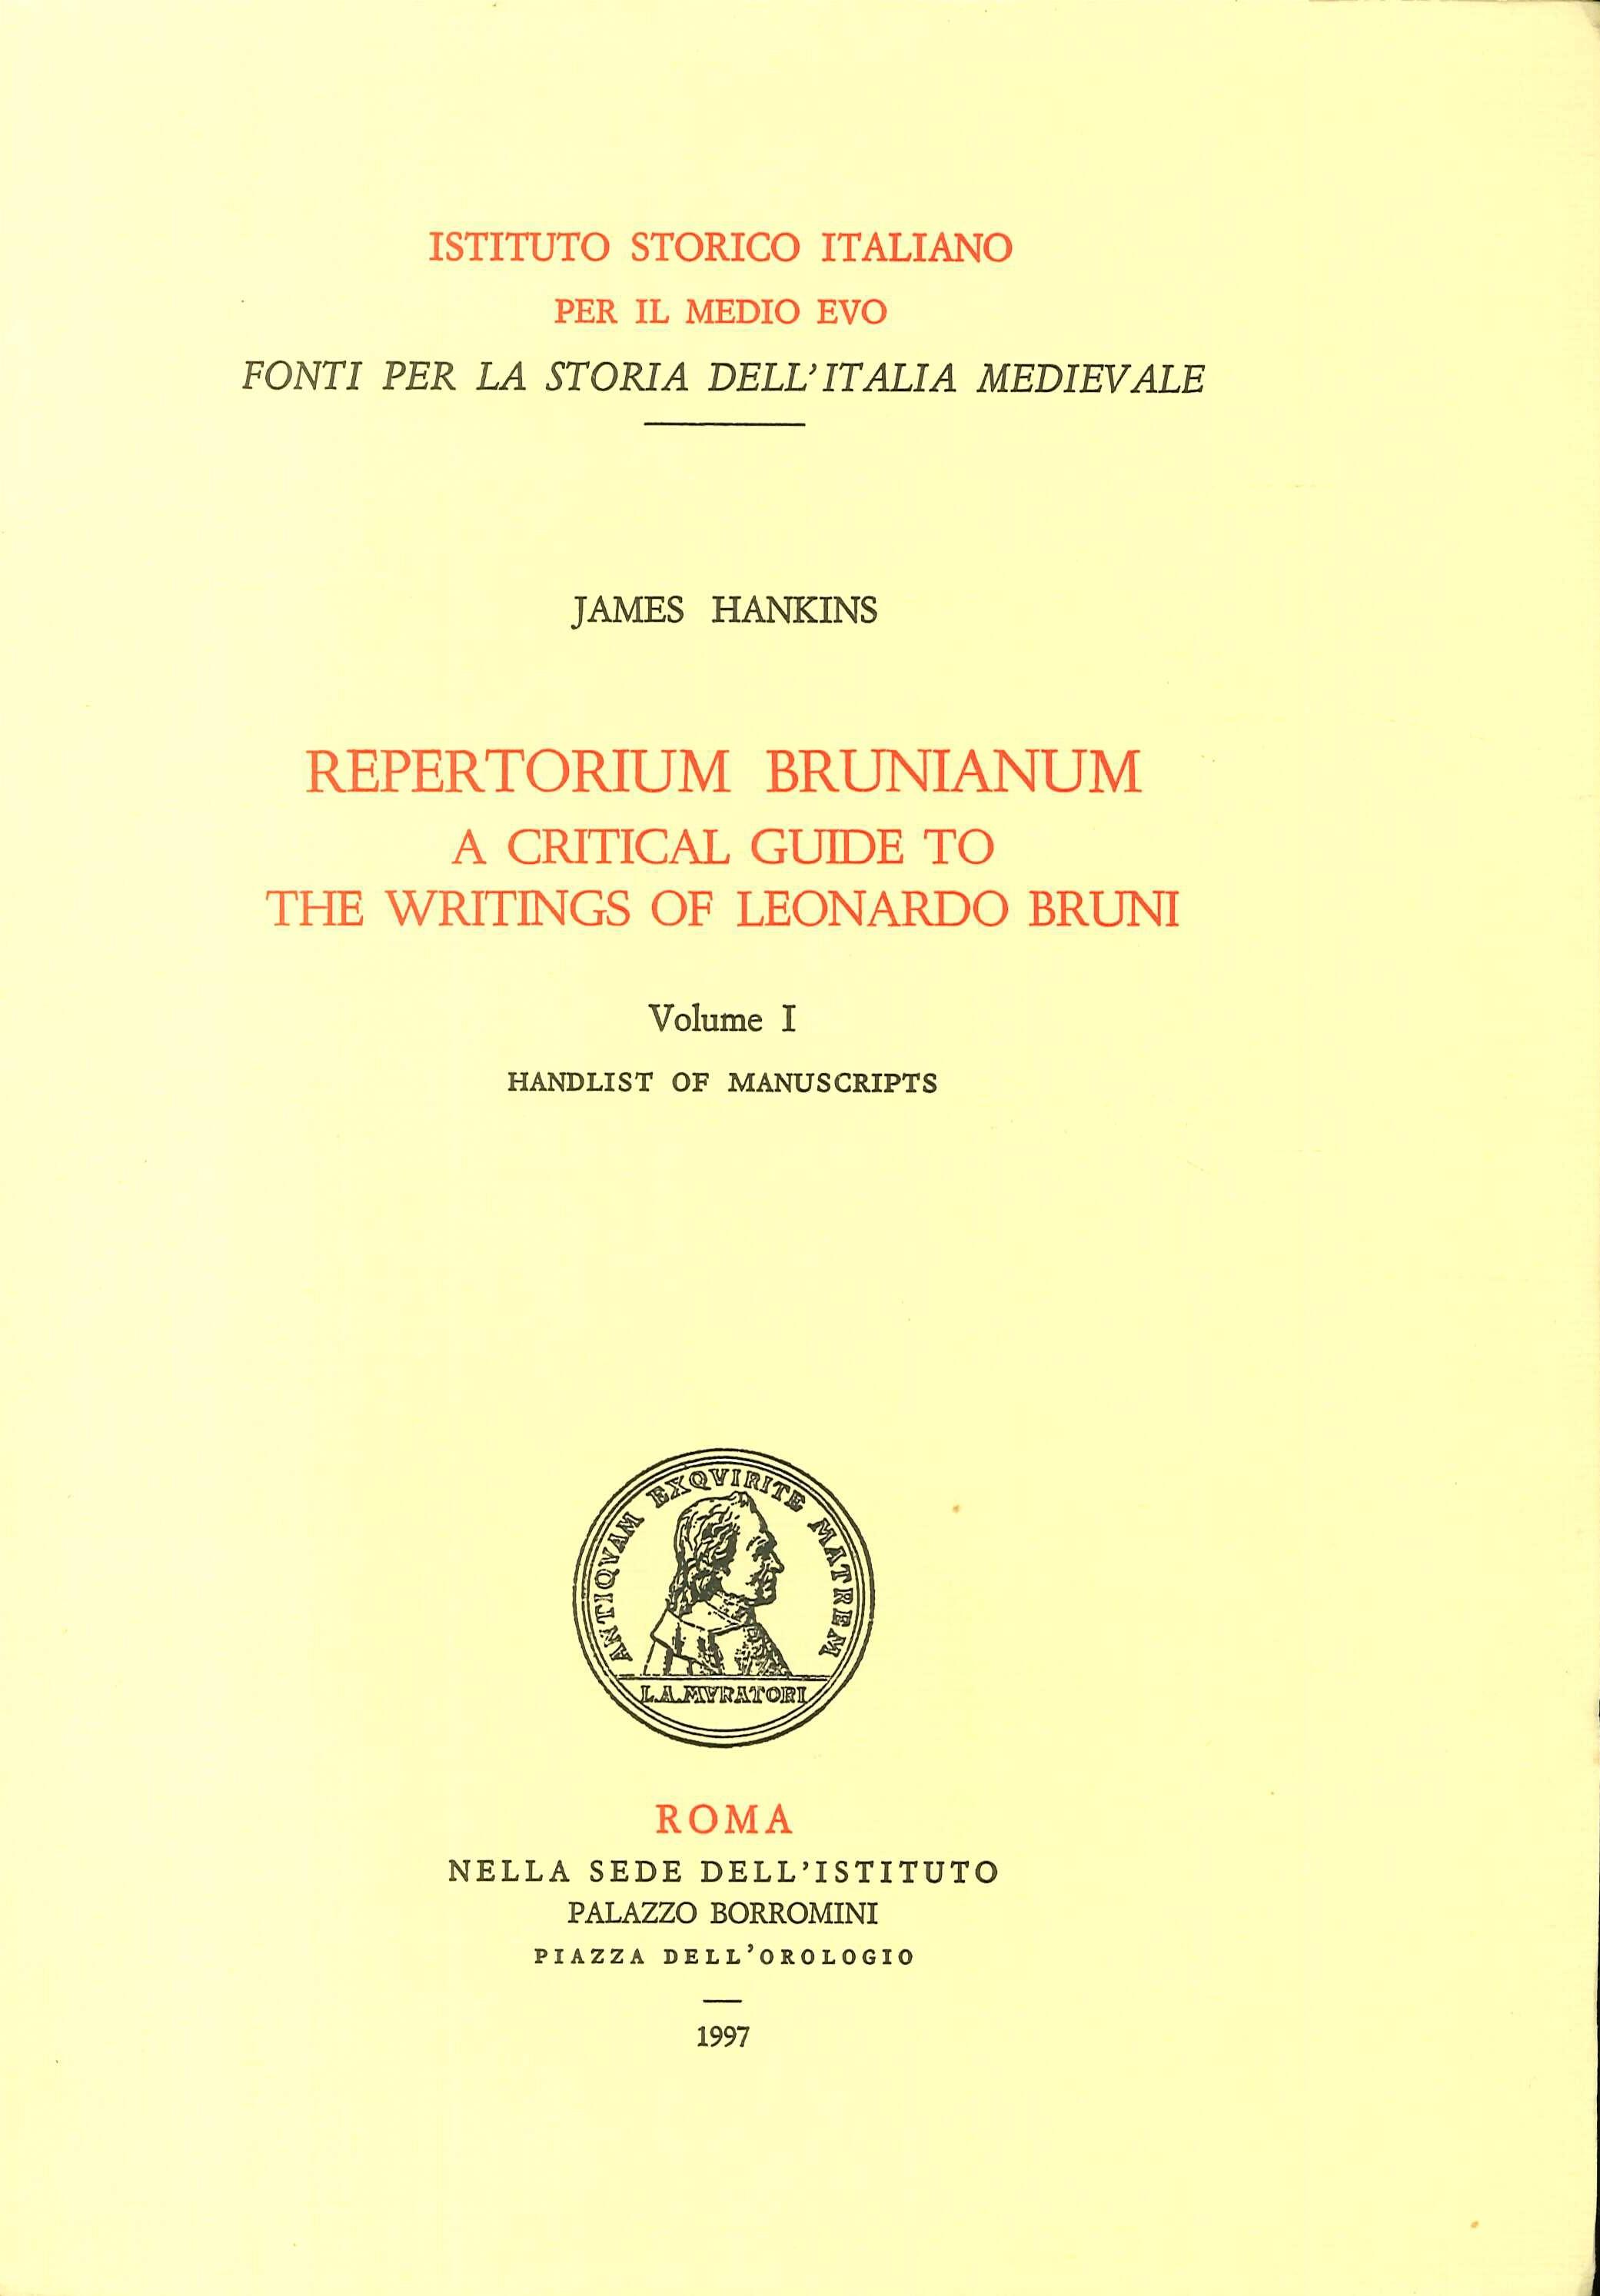 Repertorium Brunianum. A Critical Guide To the Writings of Leonardo Bruni. Volume I - handlist of manuscripts